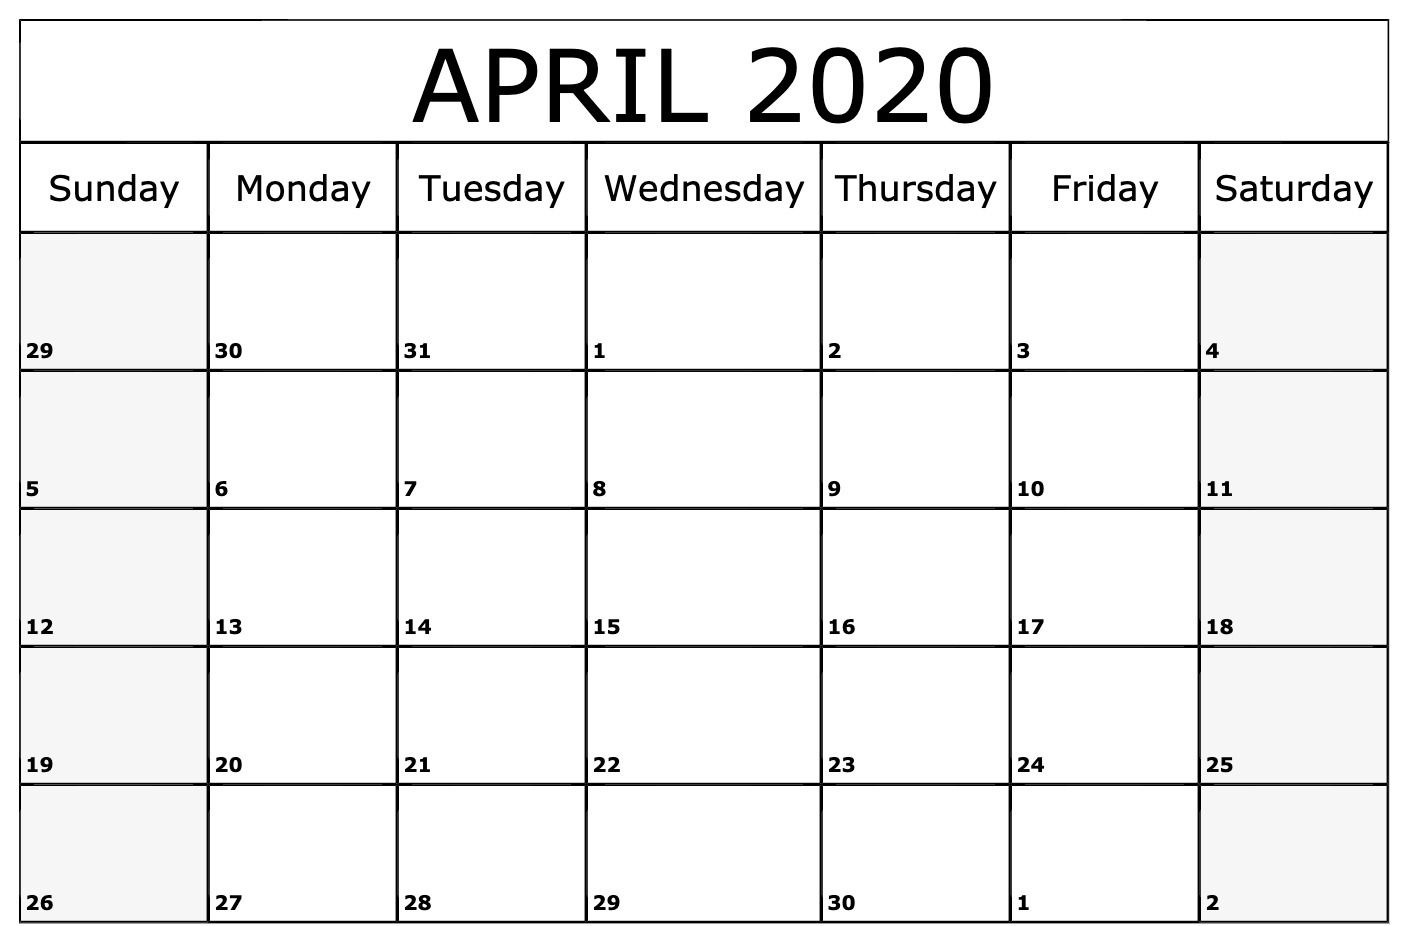 April 2020 Calendar Printable.April 2020 Calendar Printable Template 2020 Calendar